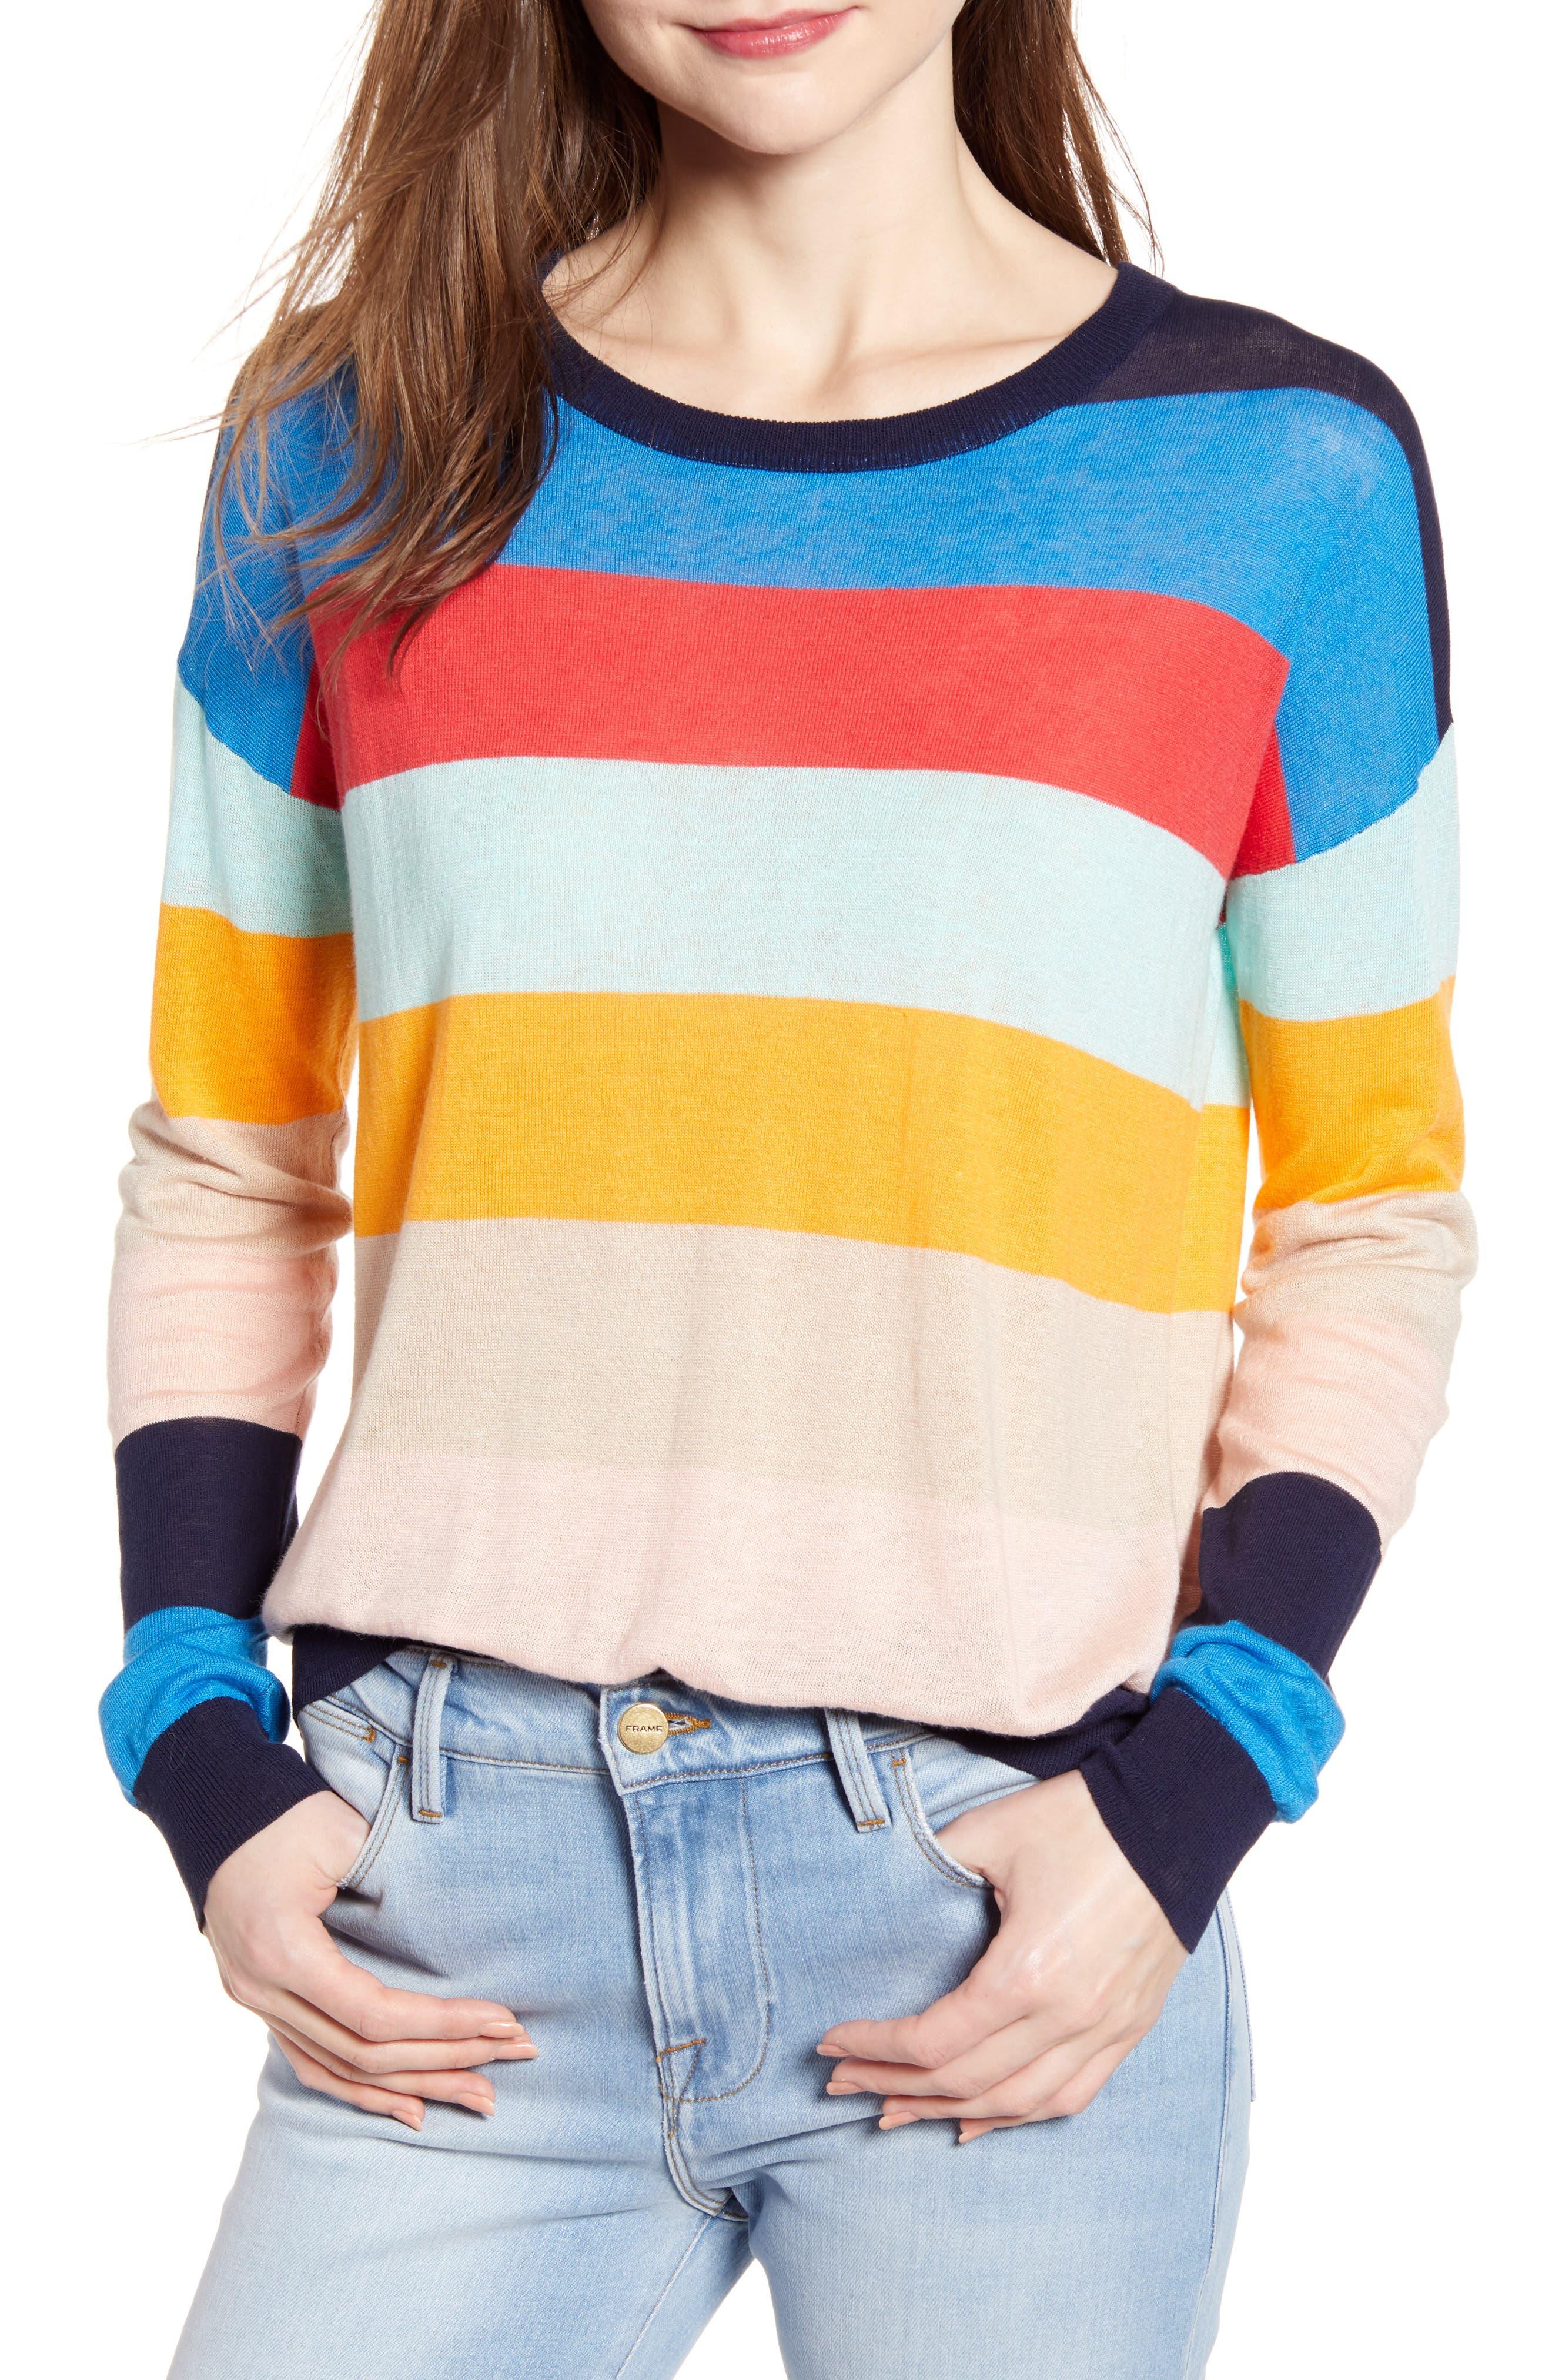 SPLENDID, Sunray Colorblock Sweater, Main thumbnail 1, color, BONFIRE MULTI